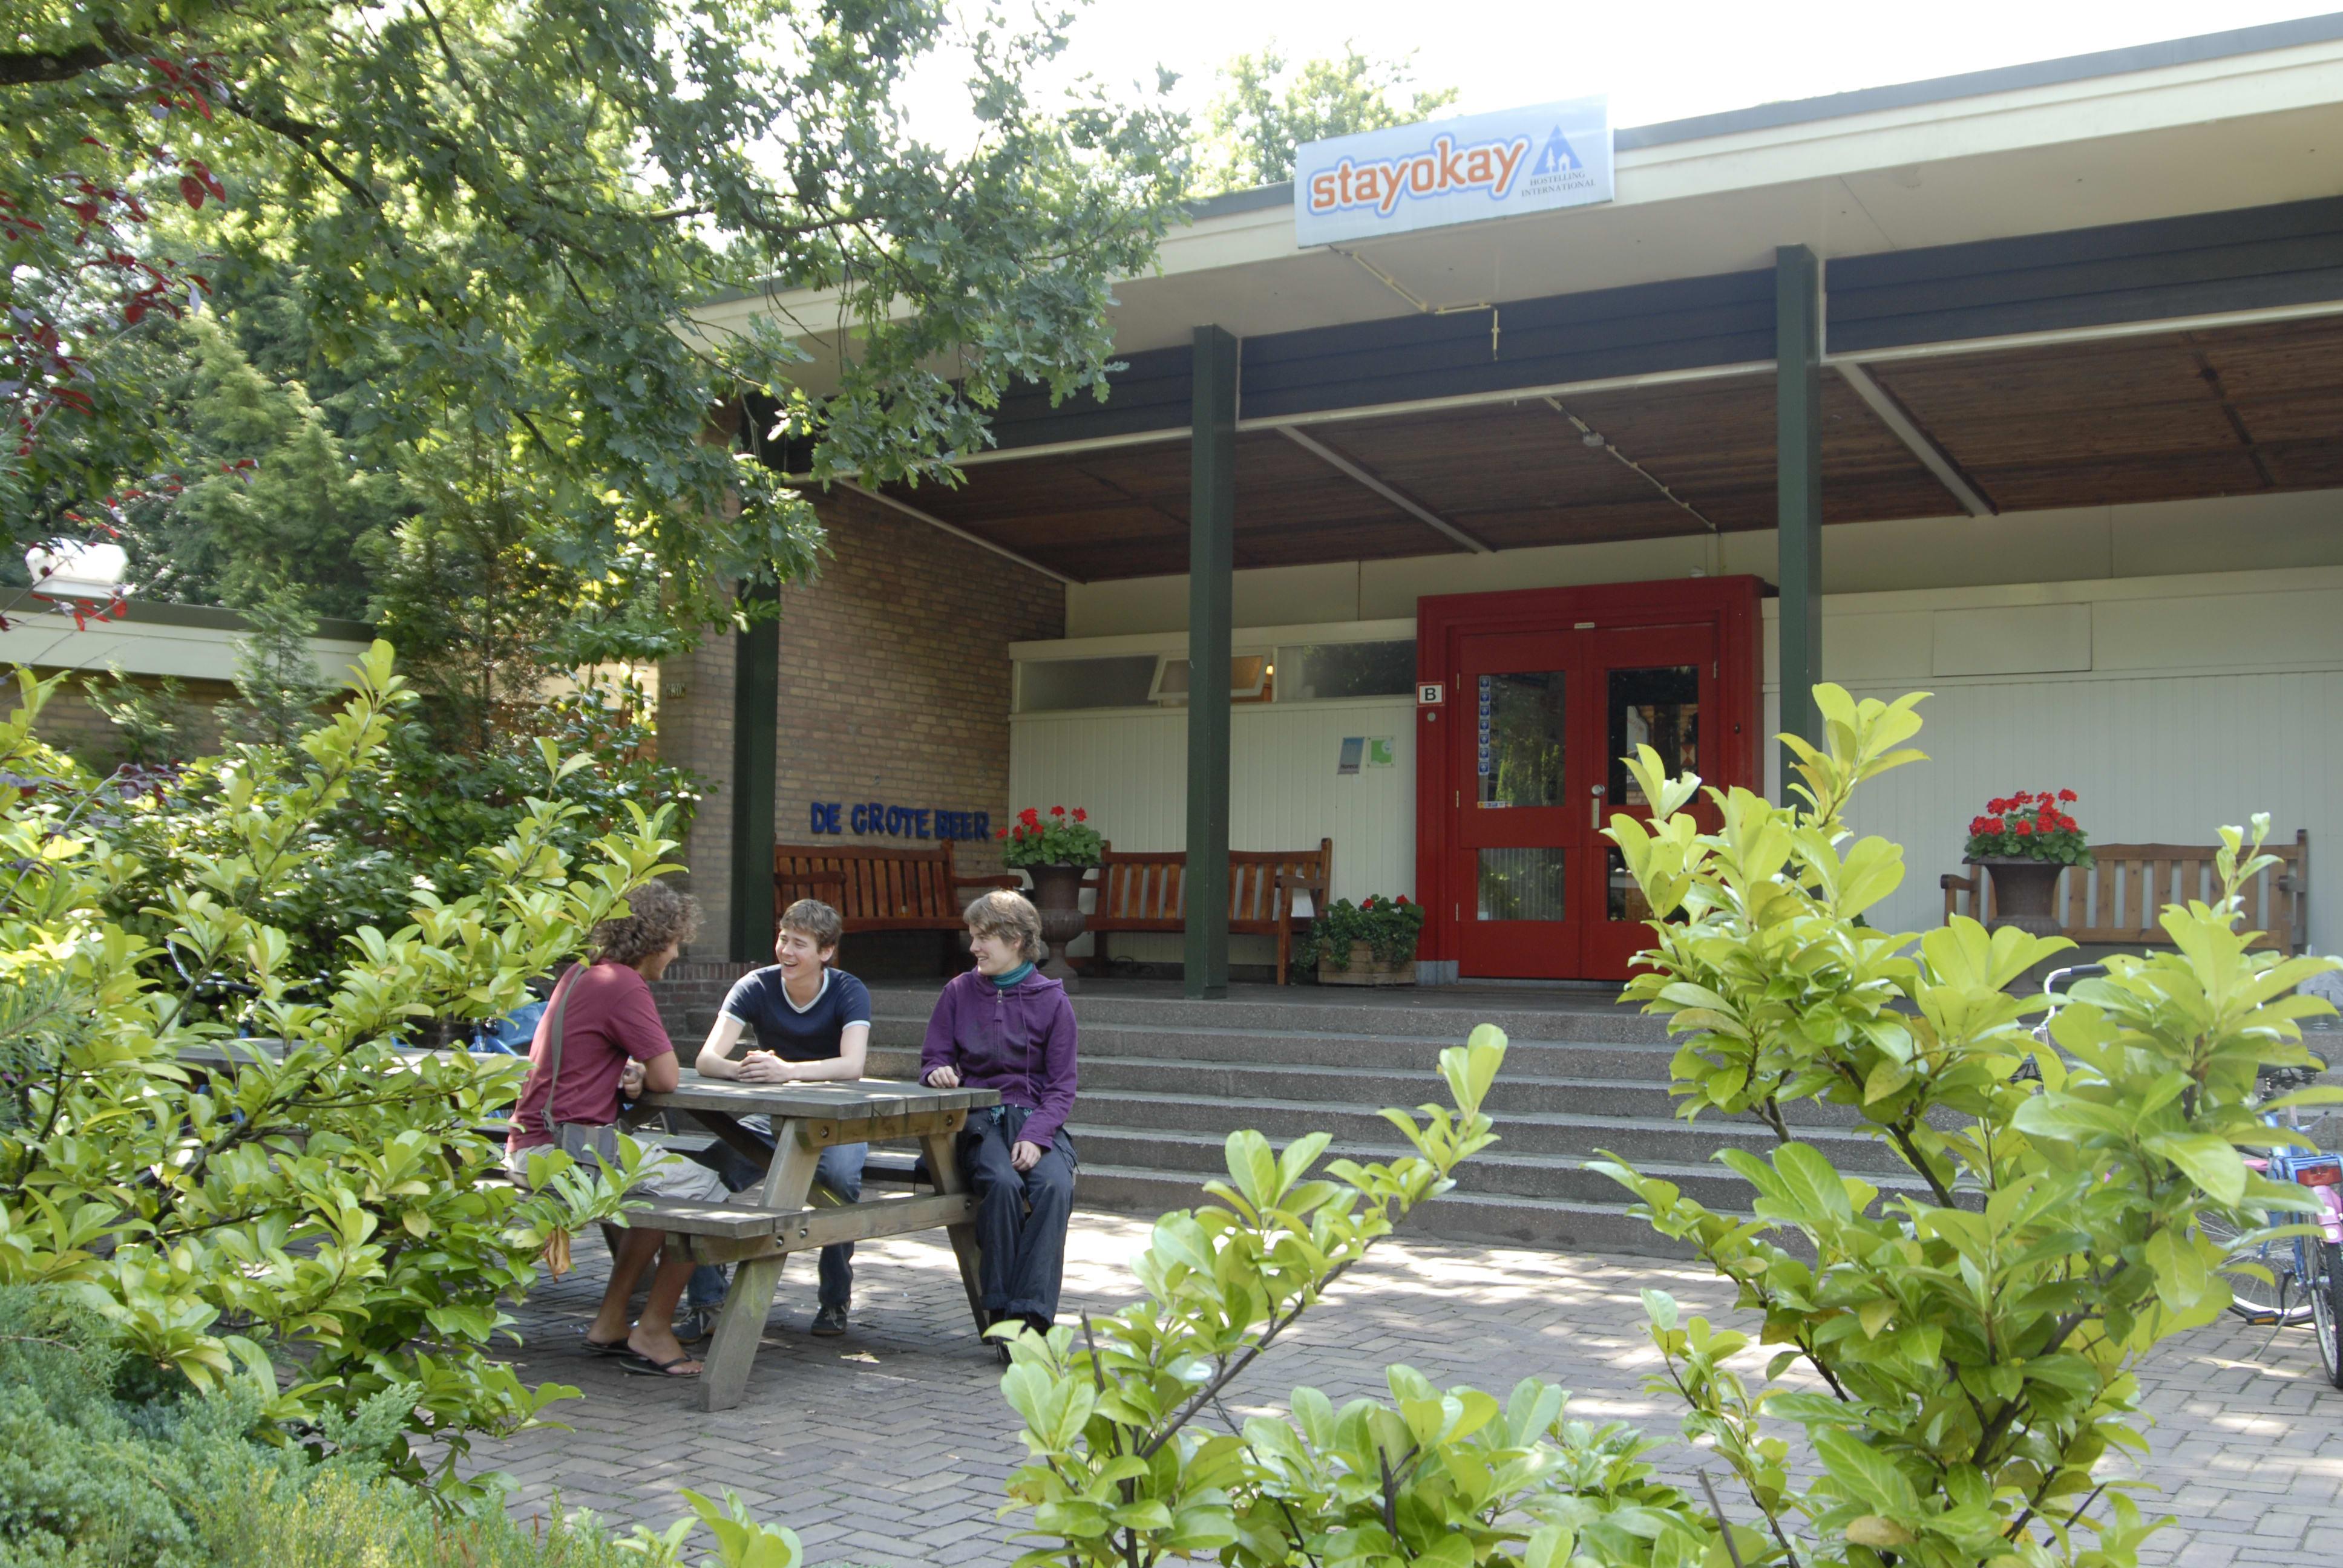 Stayokay Apeldoorn